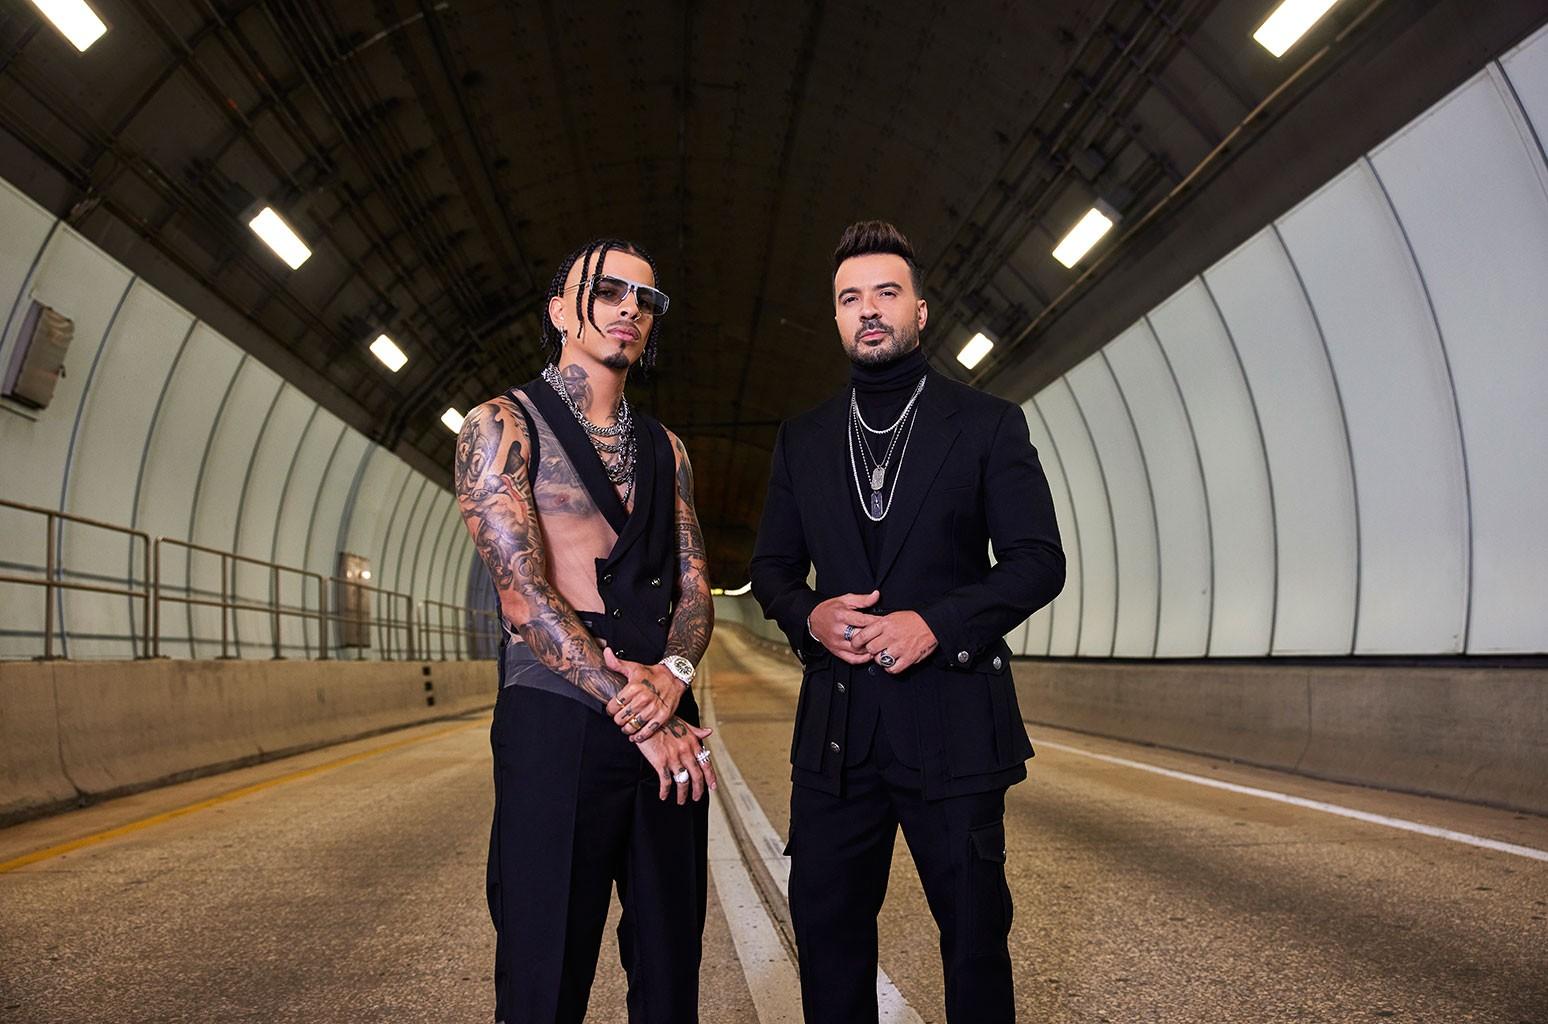 Premio Lo Nuestro 2021: Luis Fonsi & Rauw Alejandro Premiere Nostalgic Single 'Vacío'